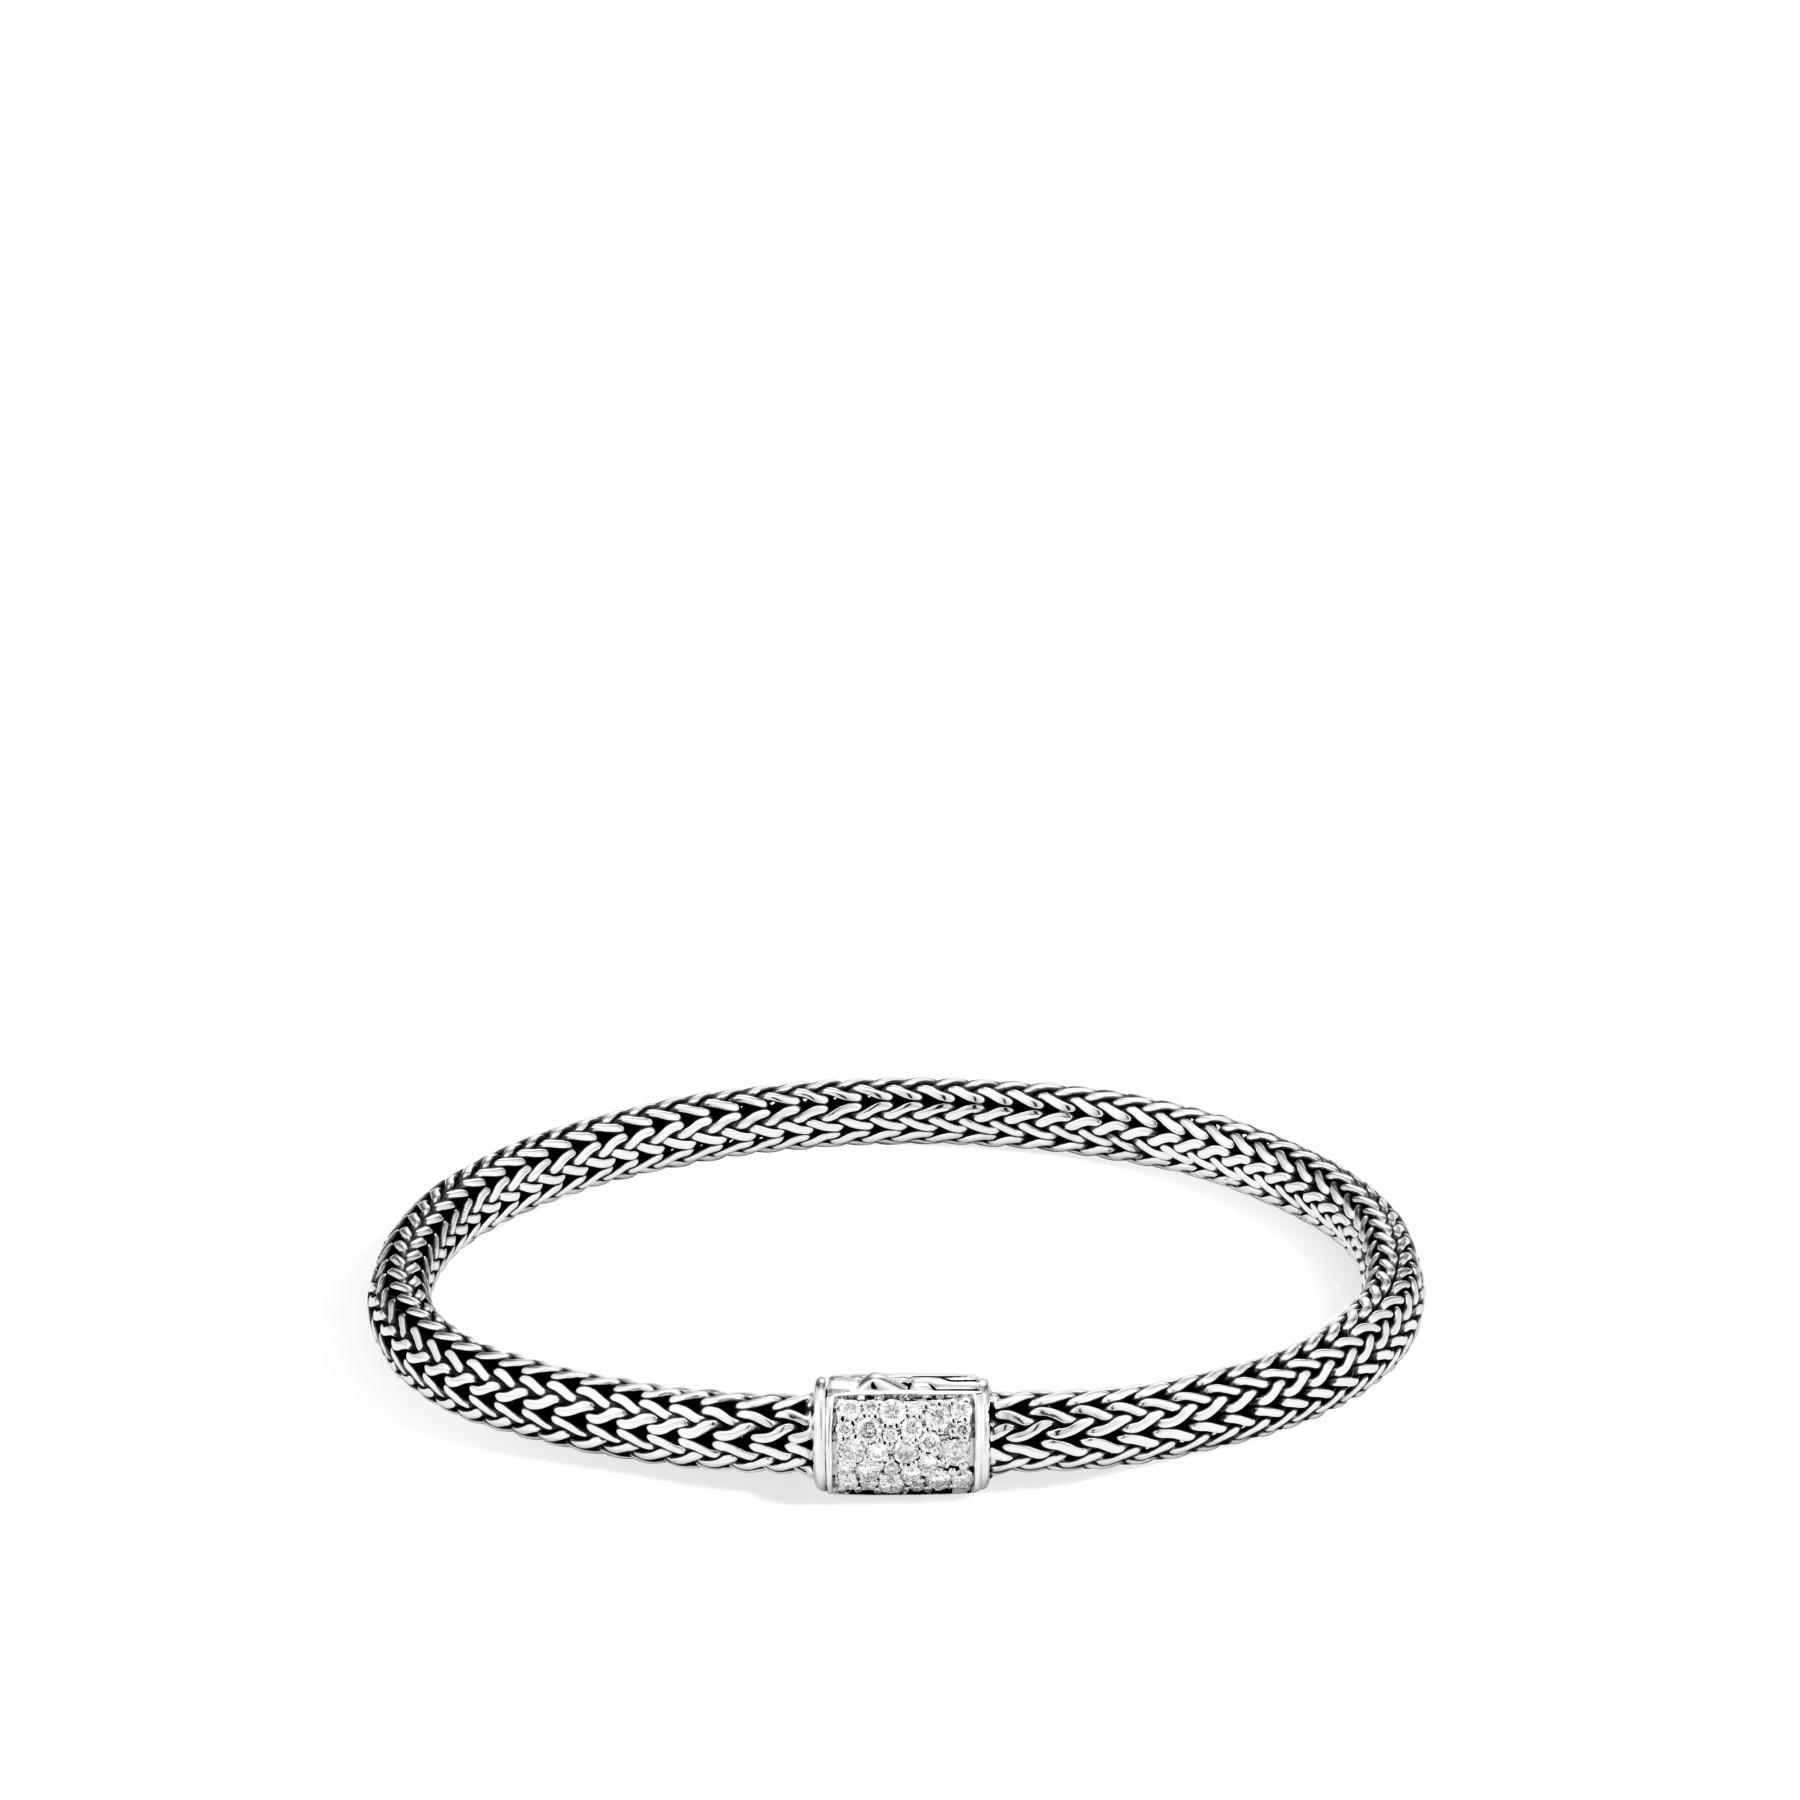 John Hardy Reversible 5mm Diamond Bracelet in Silver FRONT IMAGE